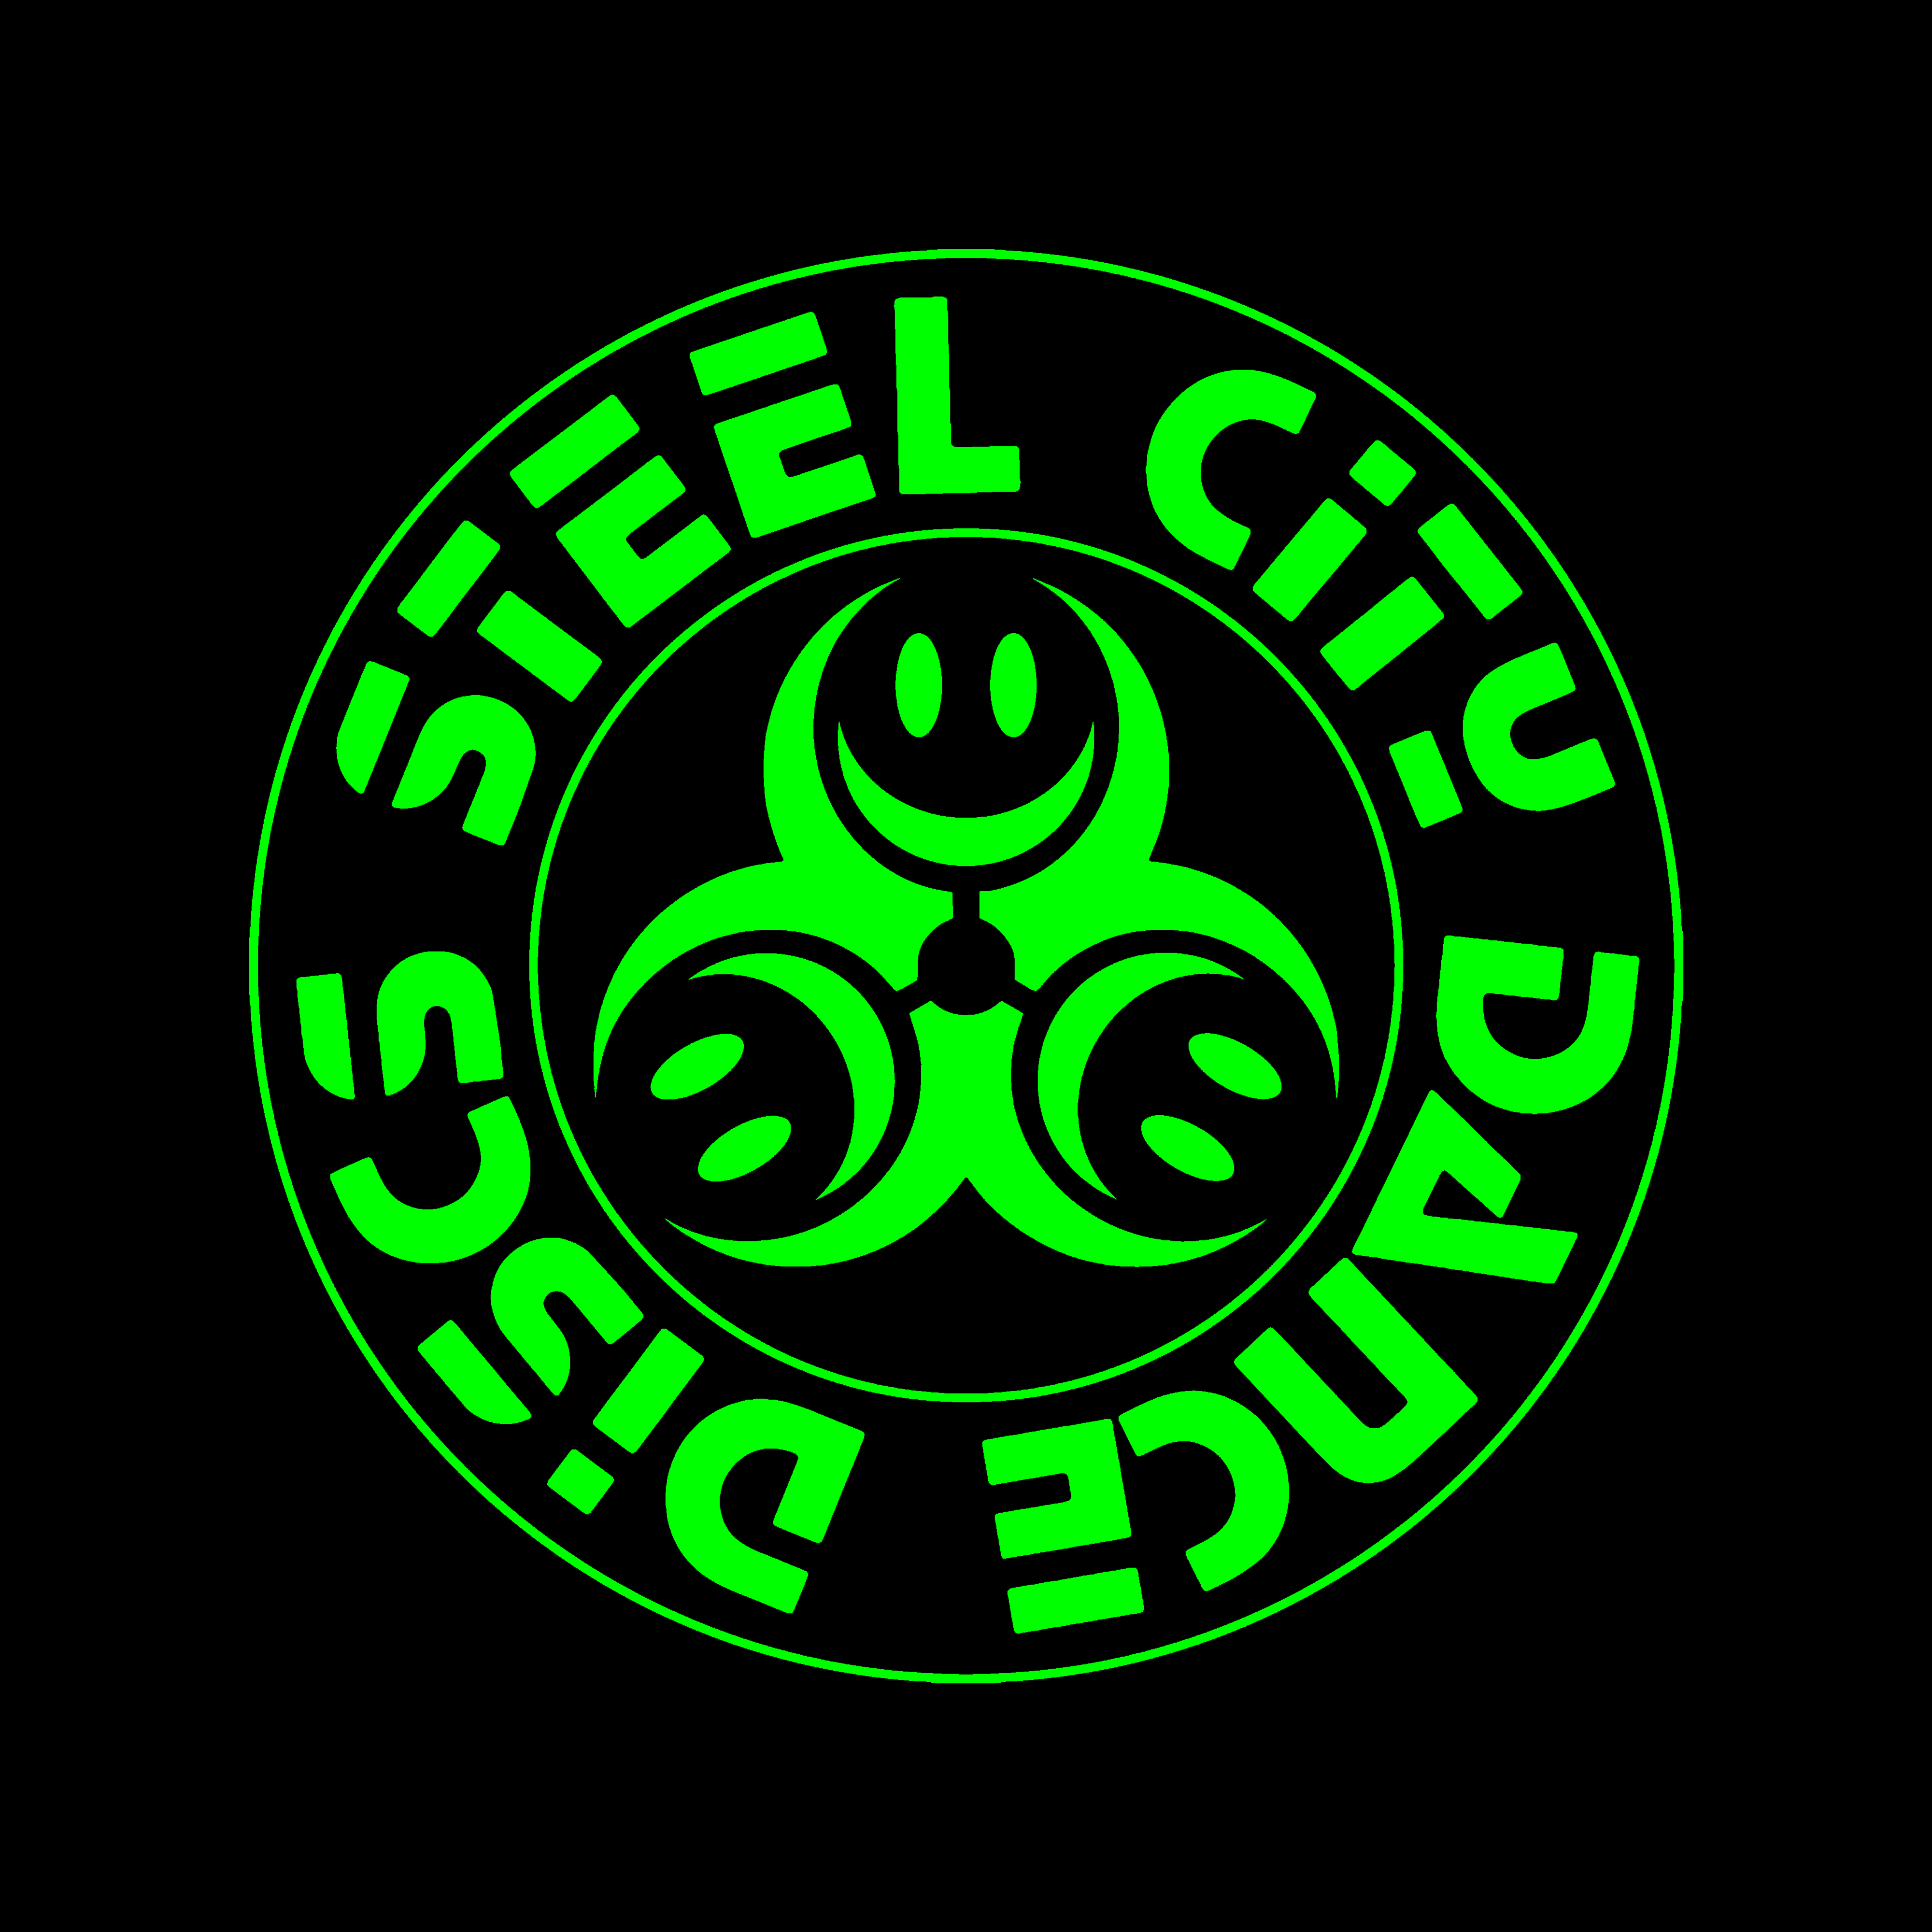 SCDD-Biosmiley-Logo